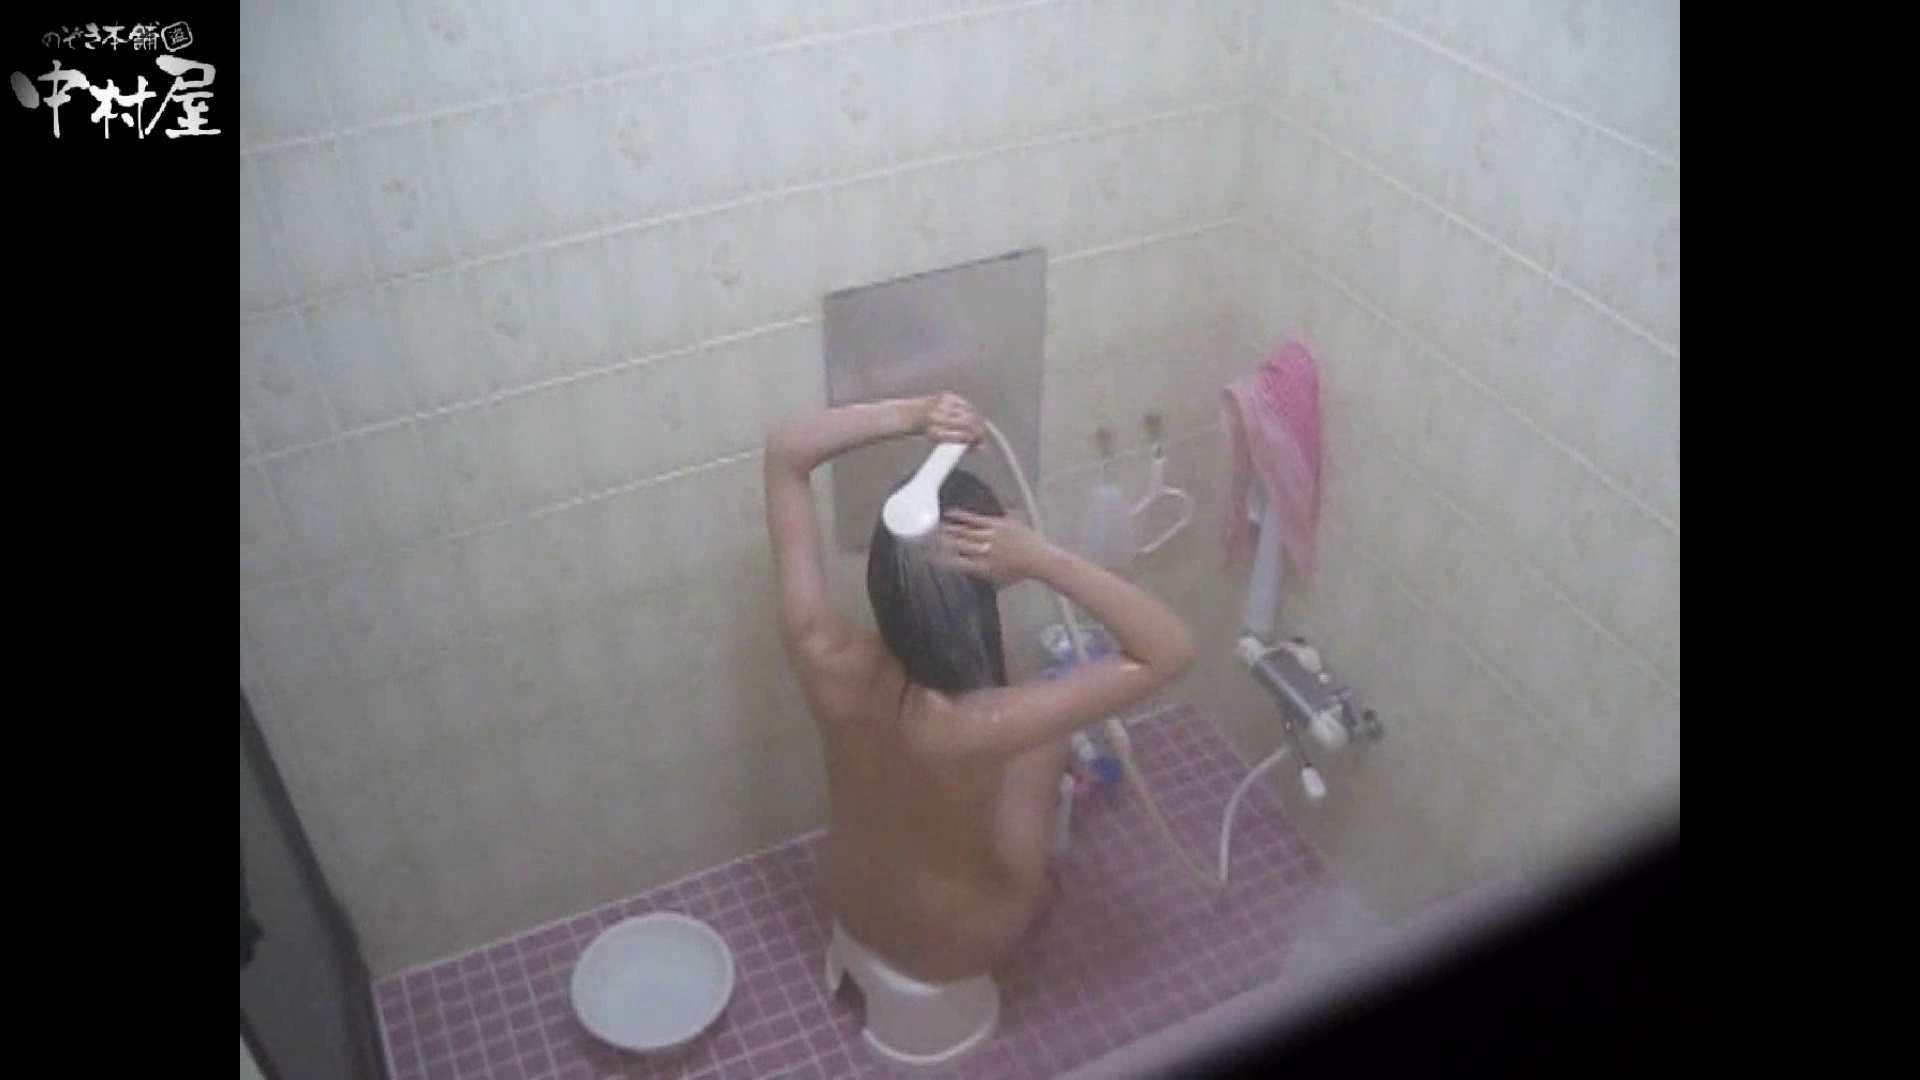 民家風呂専門盗撮師の超危険映像 vol.010 美少女のエロ生活  90連発 90